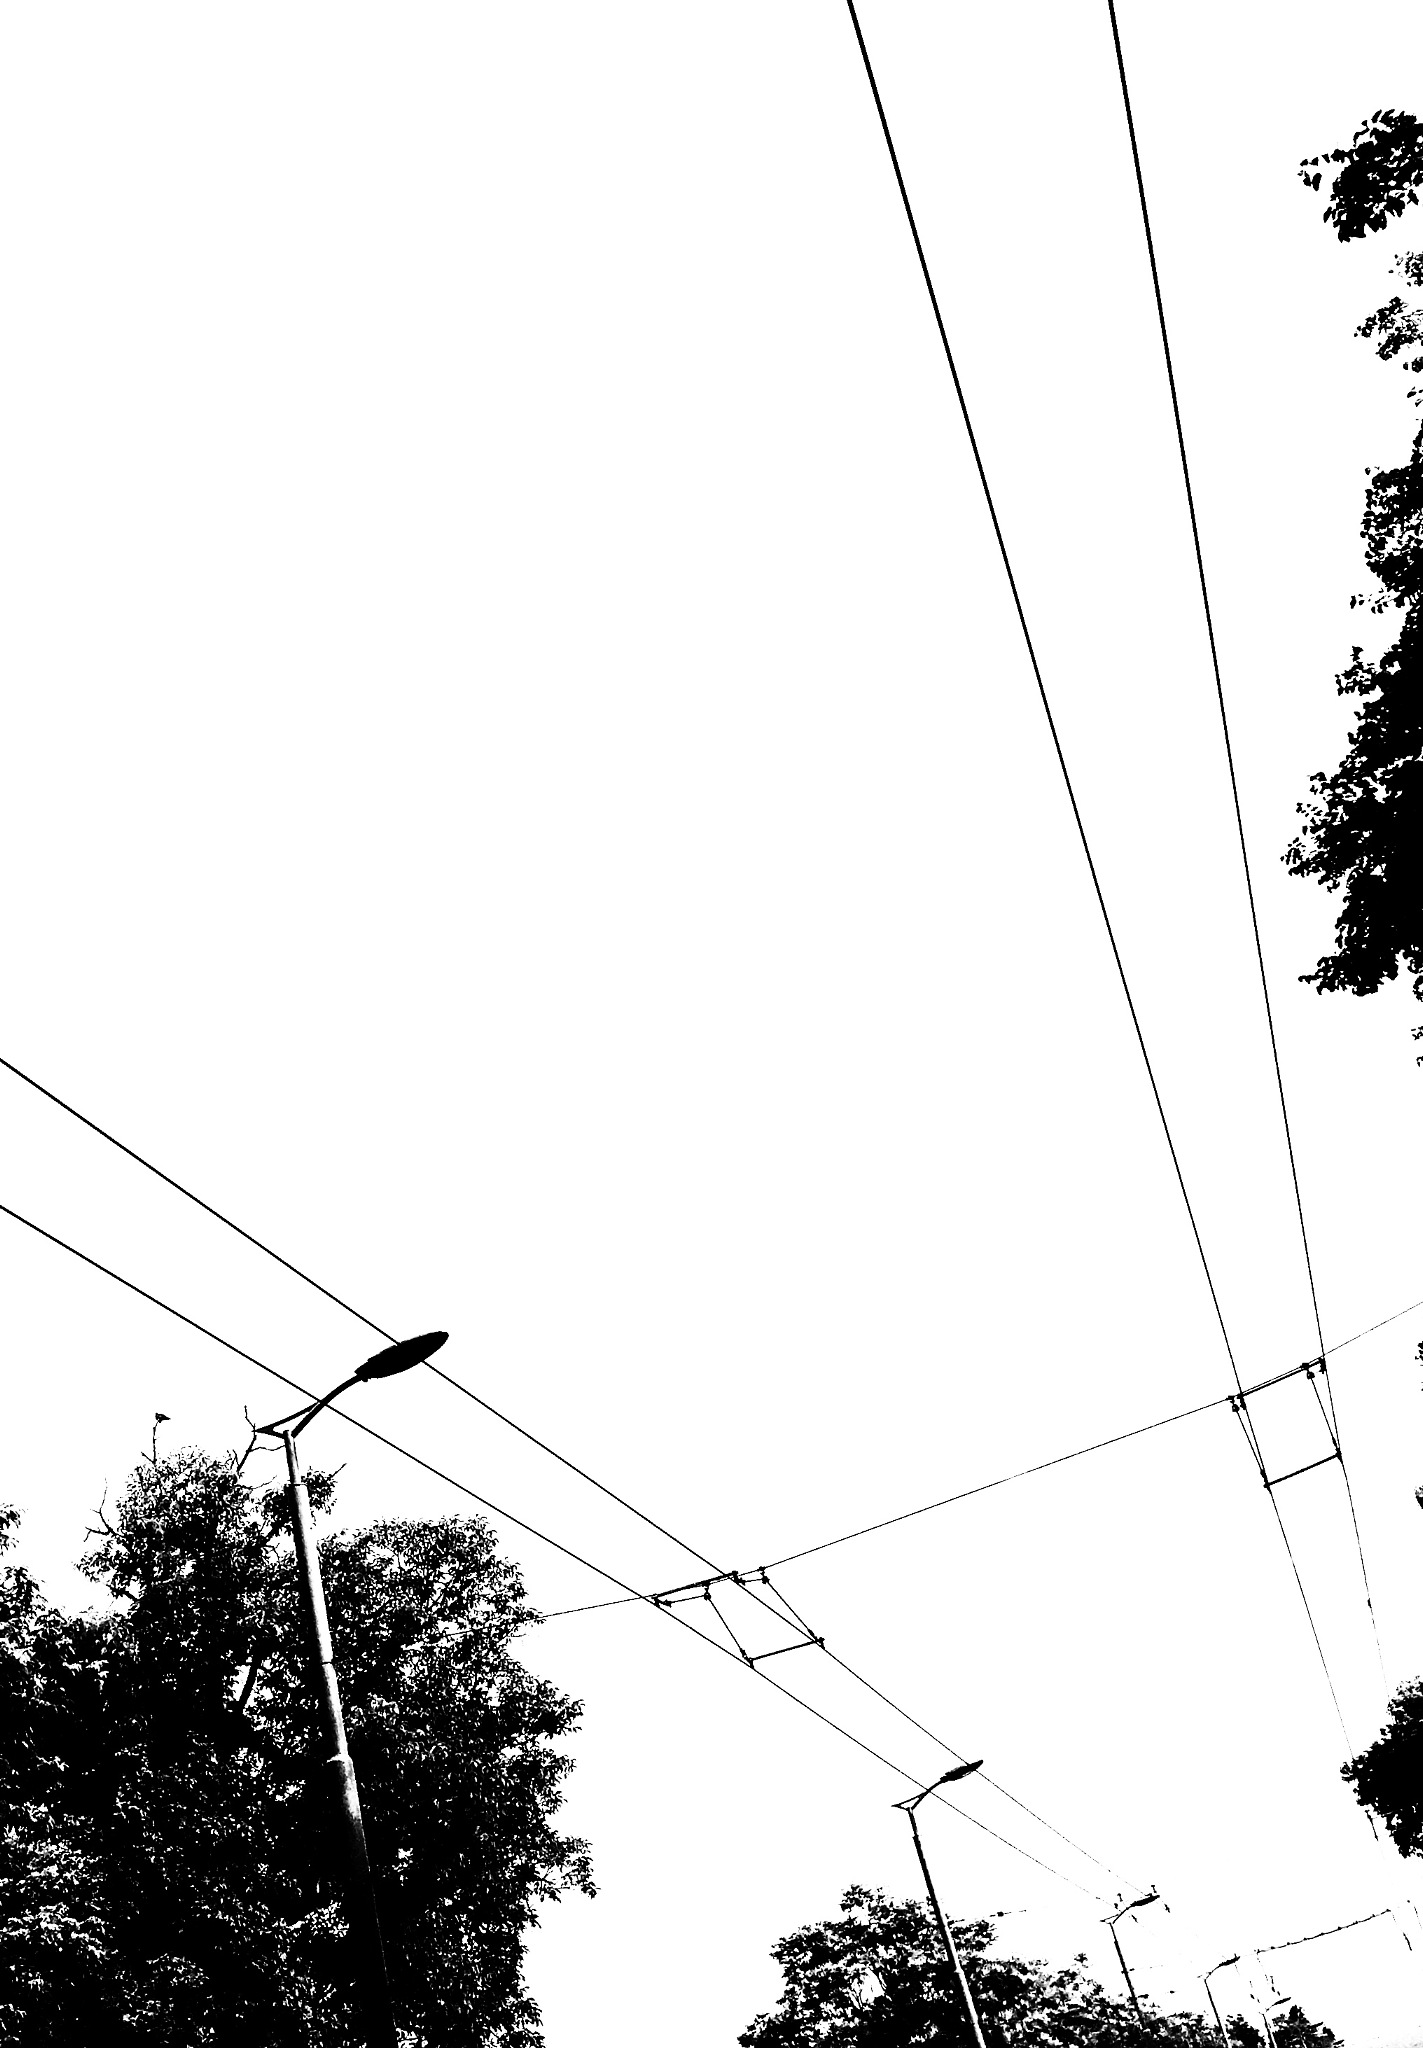 #abovemyhead by Anne Marie Alves-Curcic